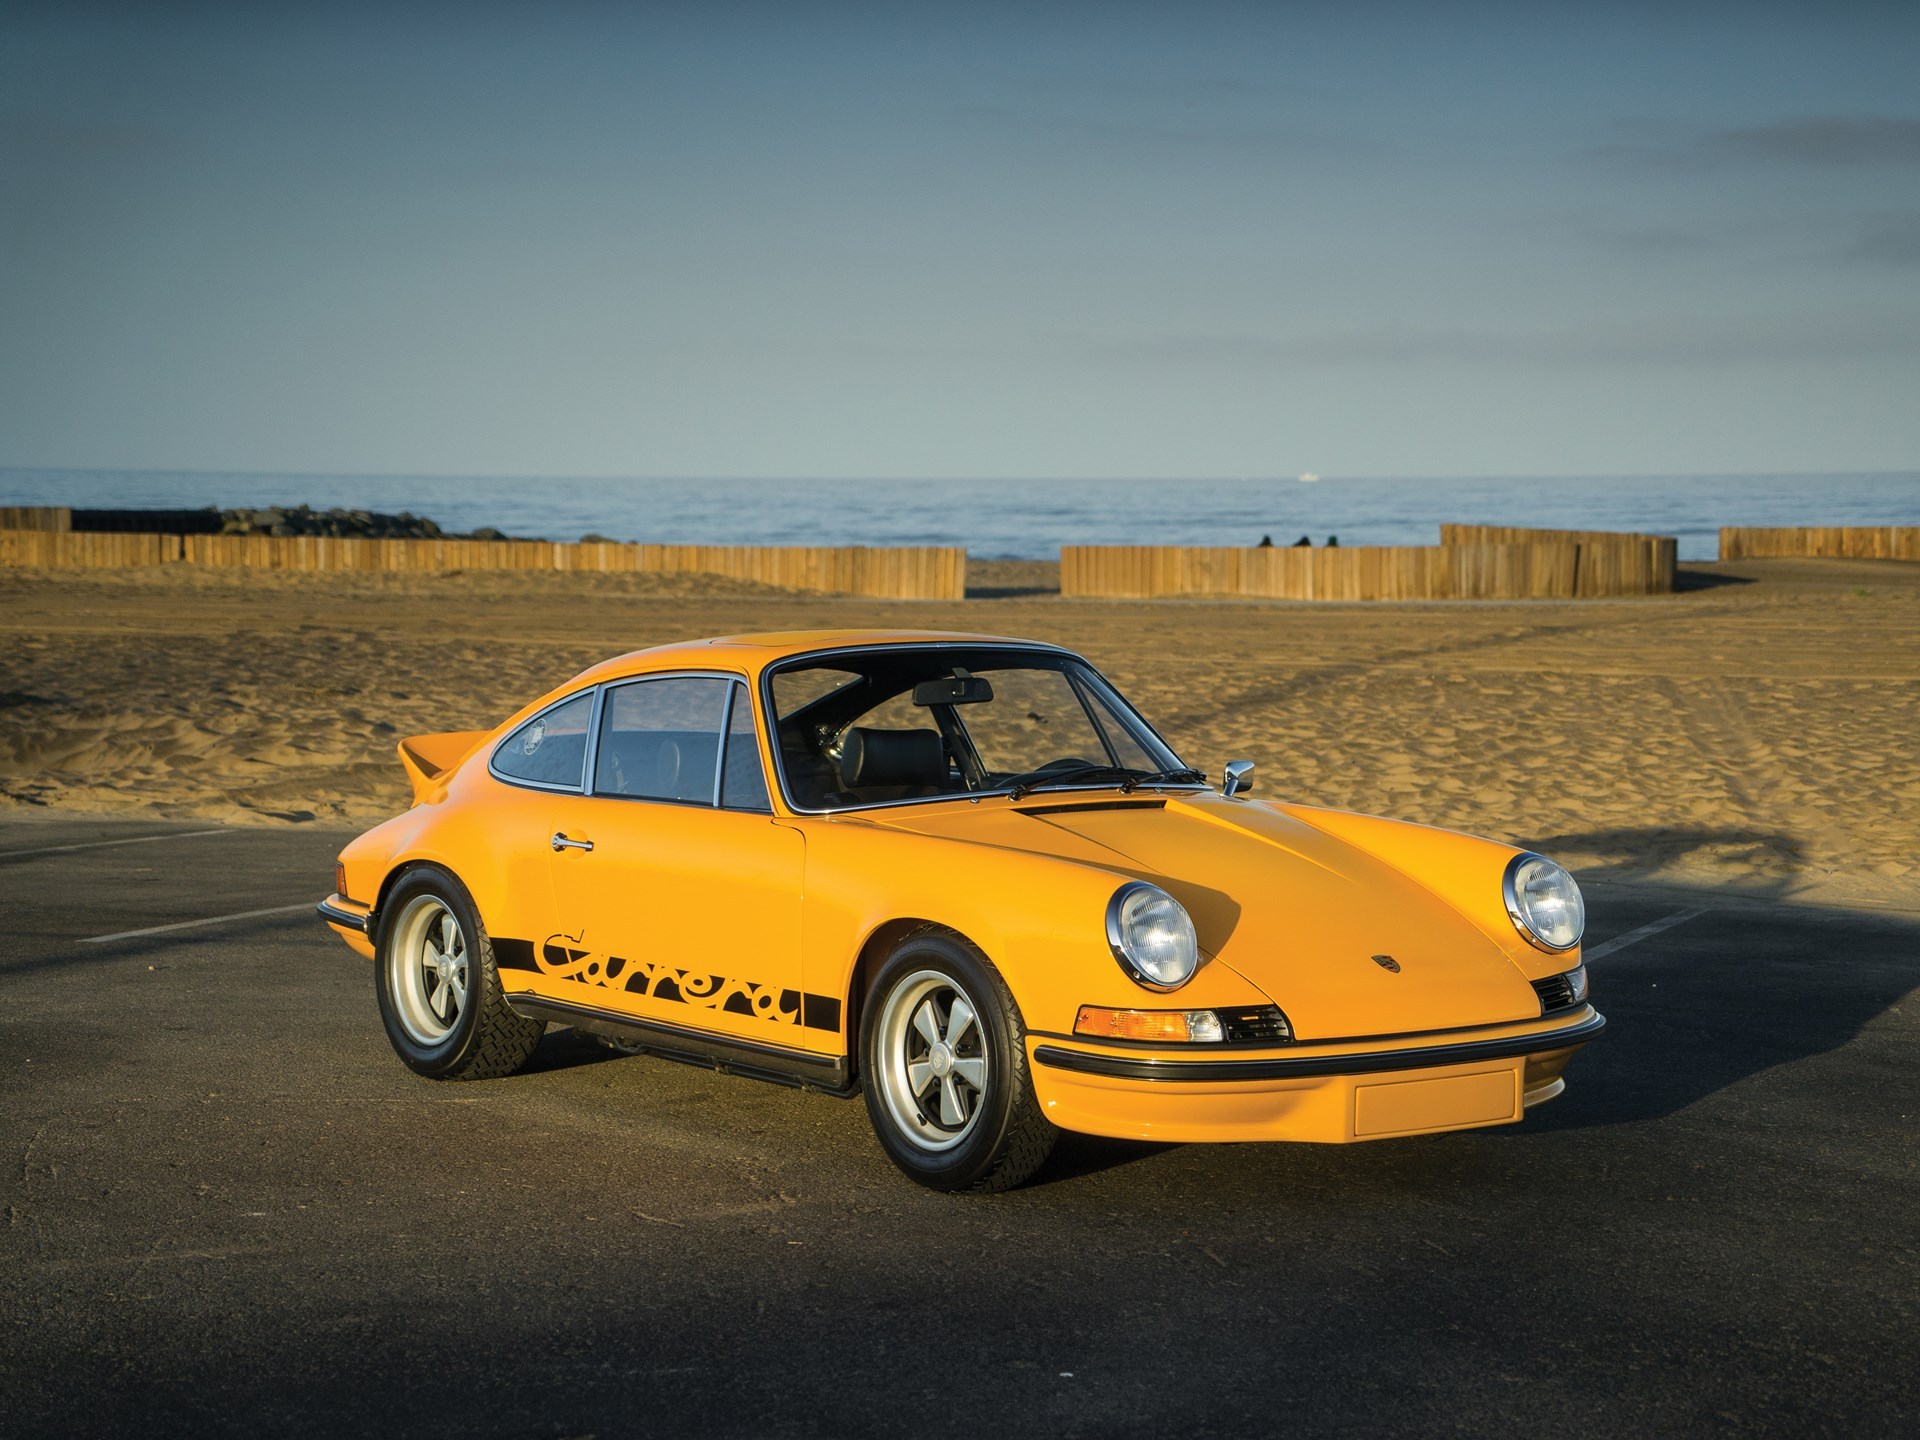 1973 Porsche 911 Carrera RS 2.7 Touring